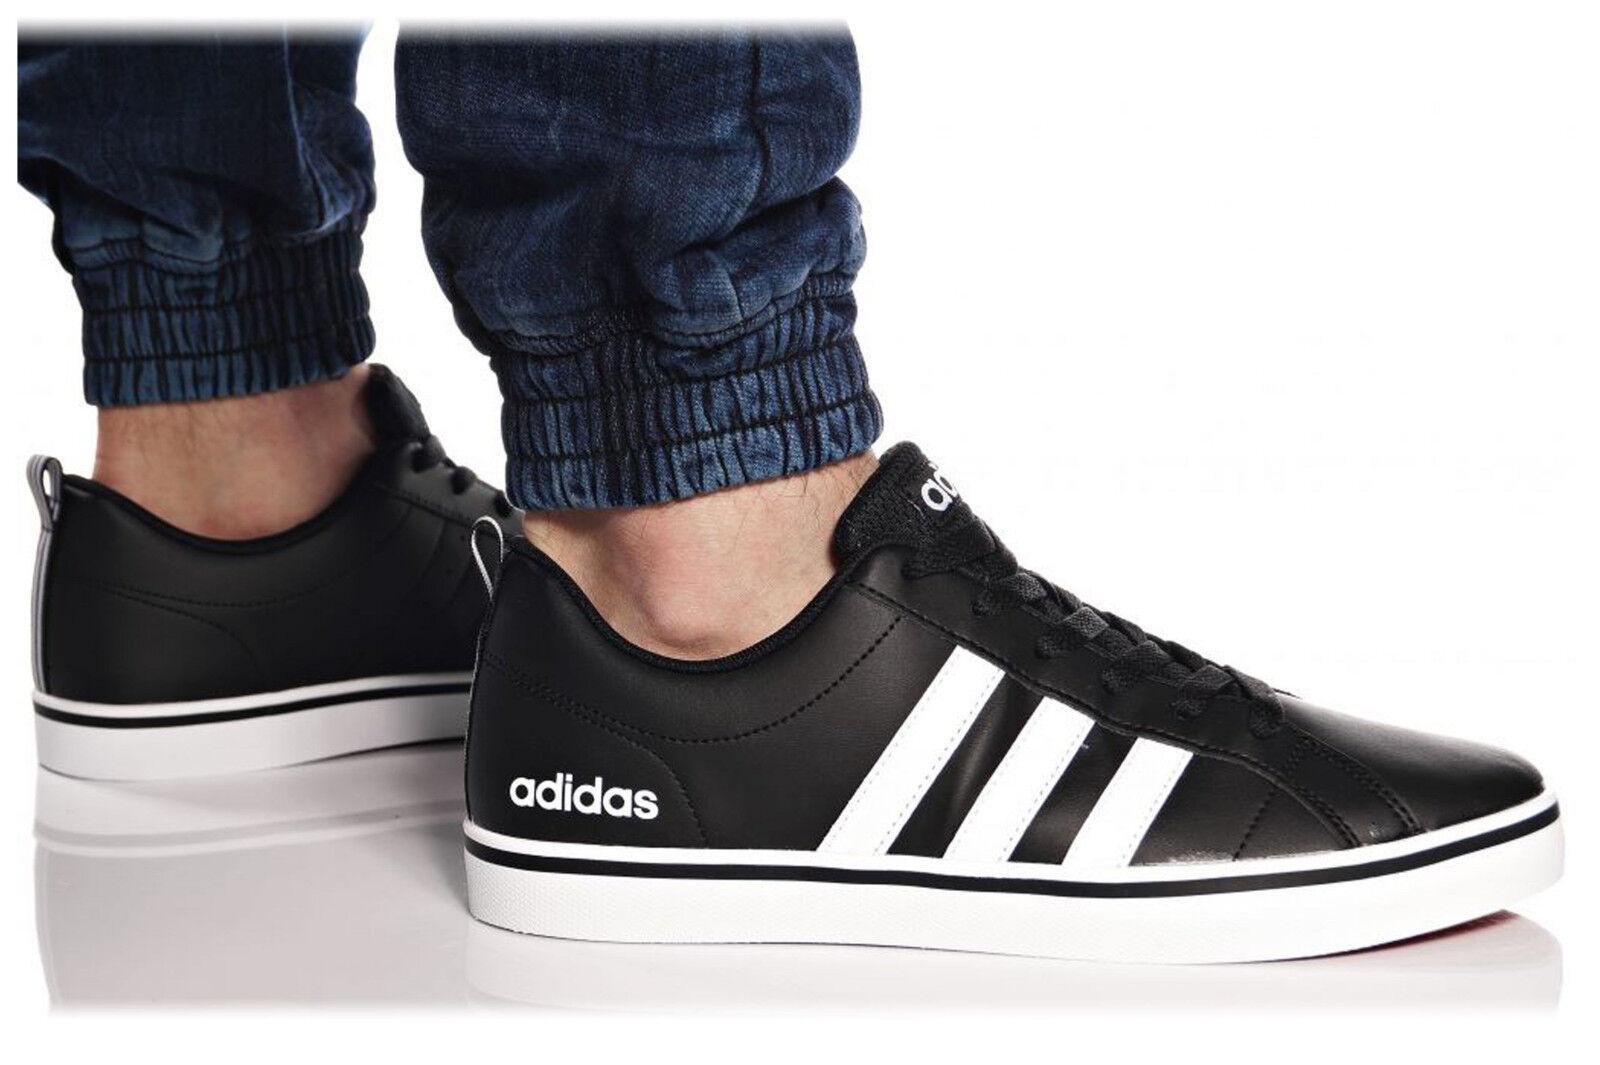 Vs Shoes Pace B74494 Man Adidas New 3 Fashion Sneakers Men